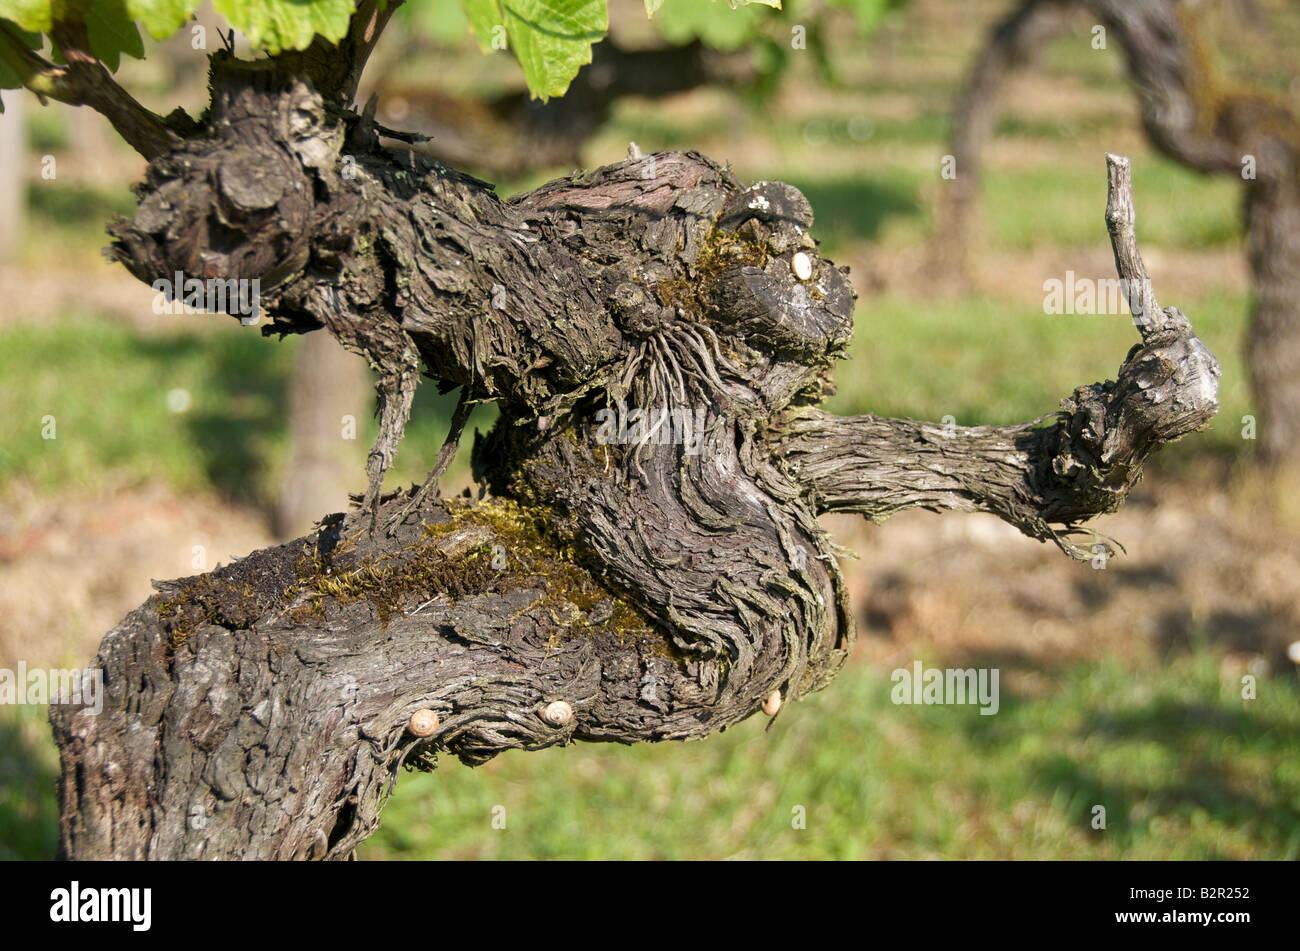 Vine. - Stock Image